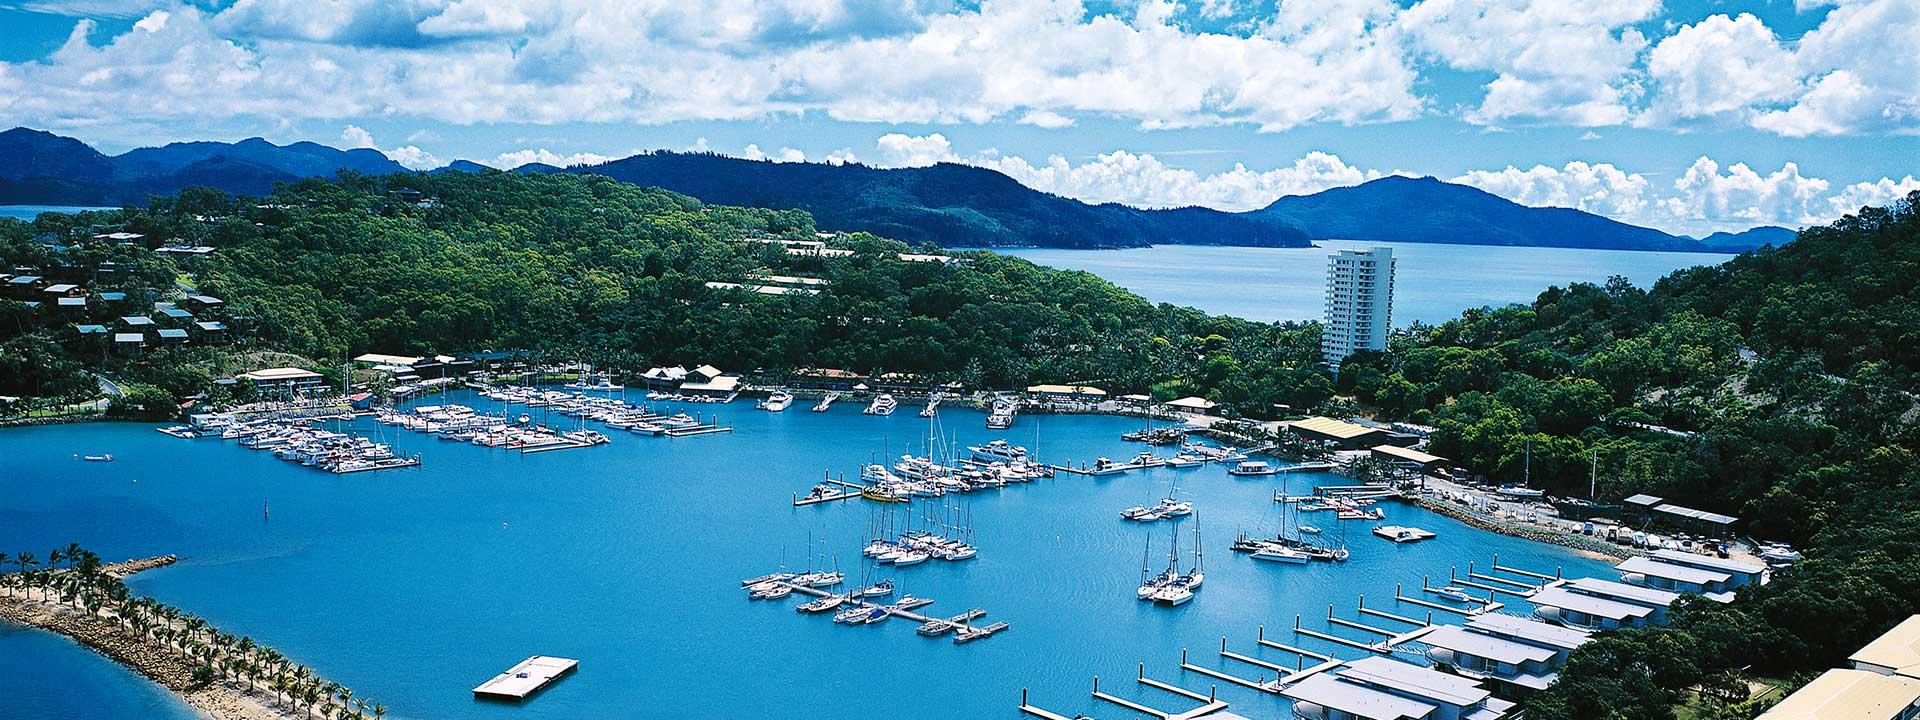 Take in the beautiful view of the Hamilton Island marina